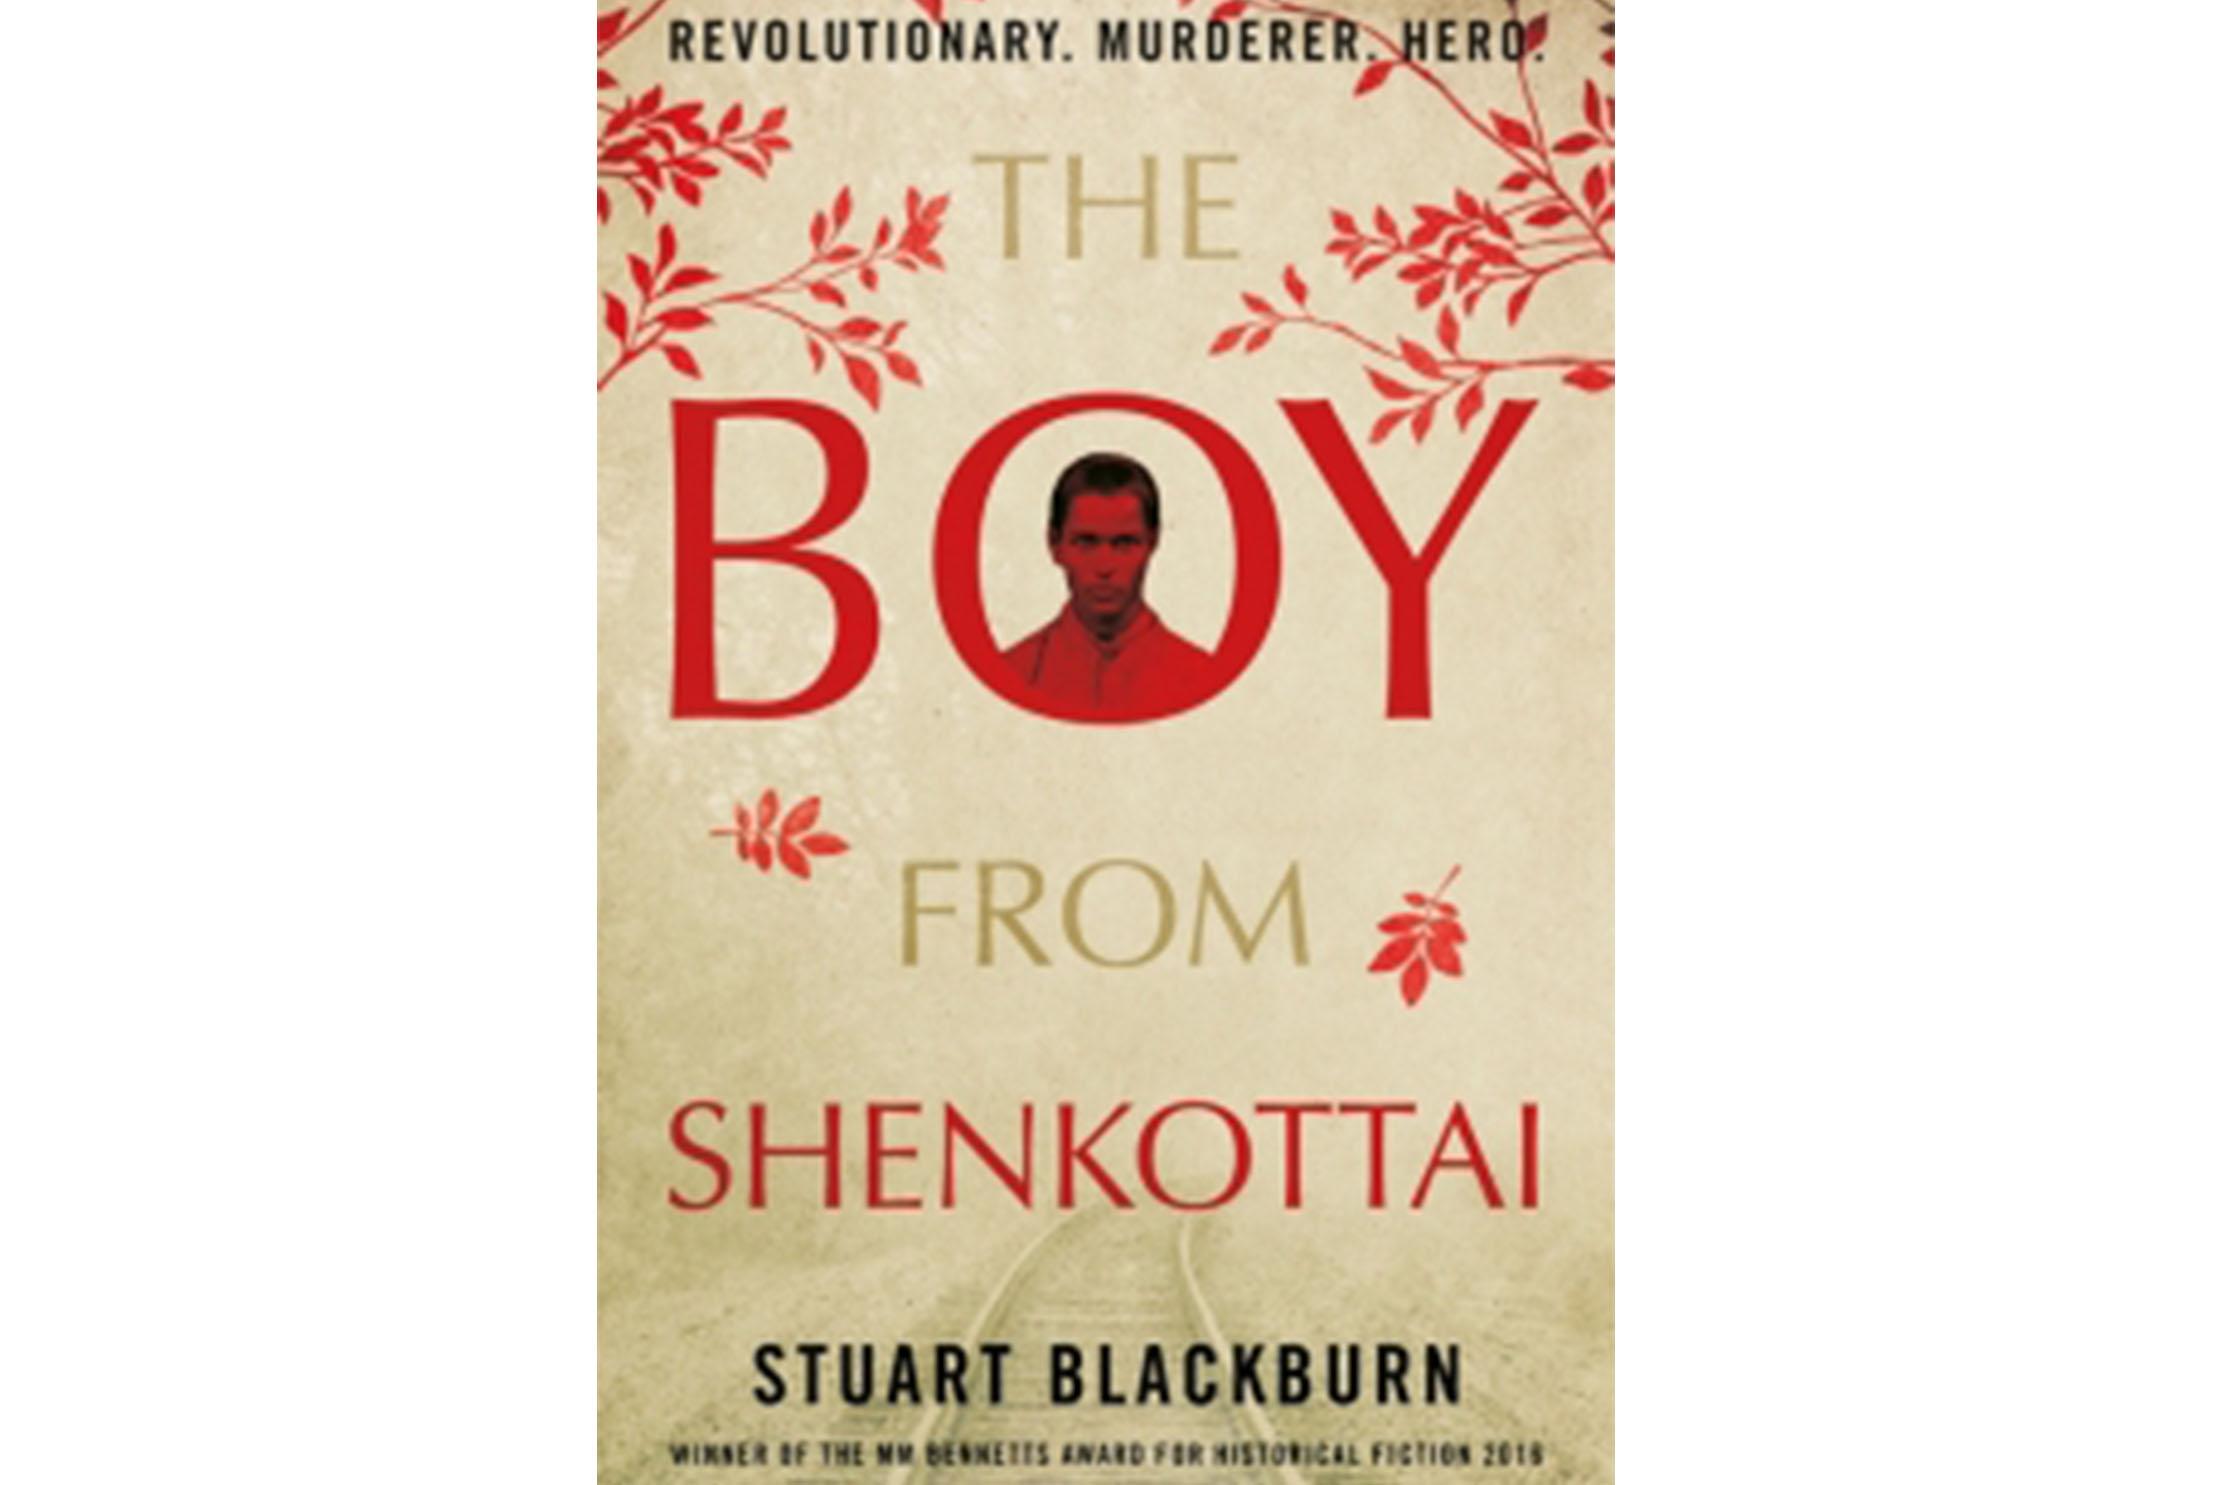 BN1 talks to Brighton-based author, Stuart Blackburn, whose historical-fiction novel The Boy from Shenkottai evokes life in the British Raj